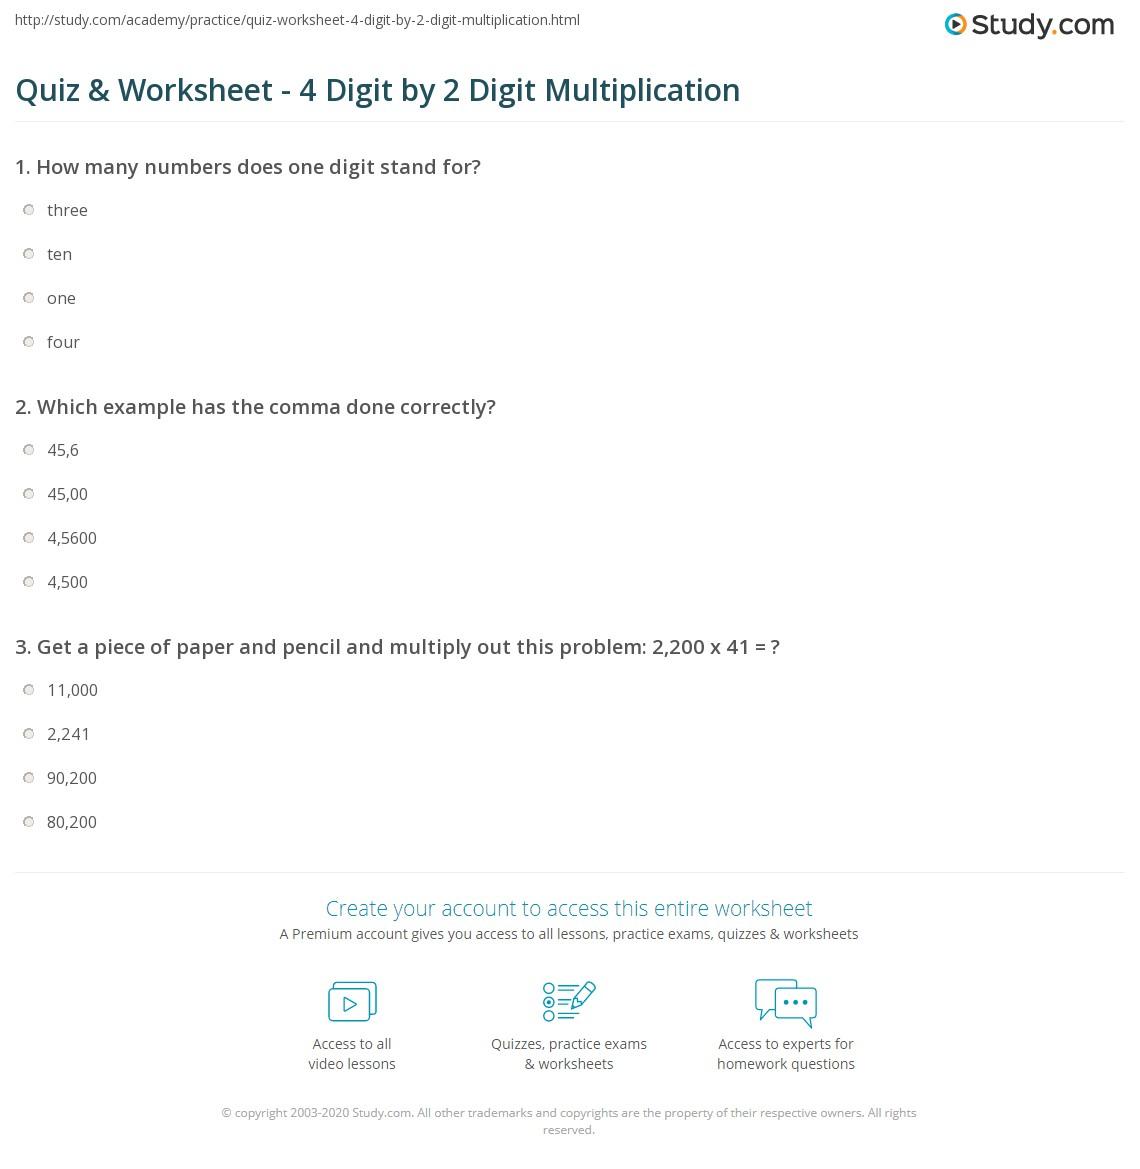 Quiz & Worksheet - 4 Digit2 Digit Multiplication | Study throughout Multiplication Worksheets 4 Digits